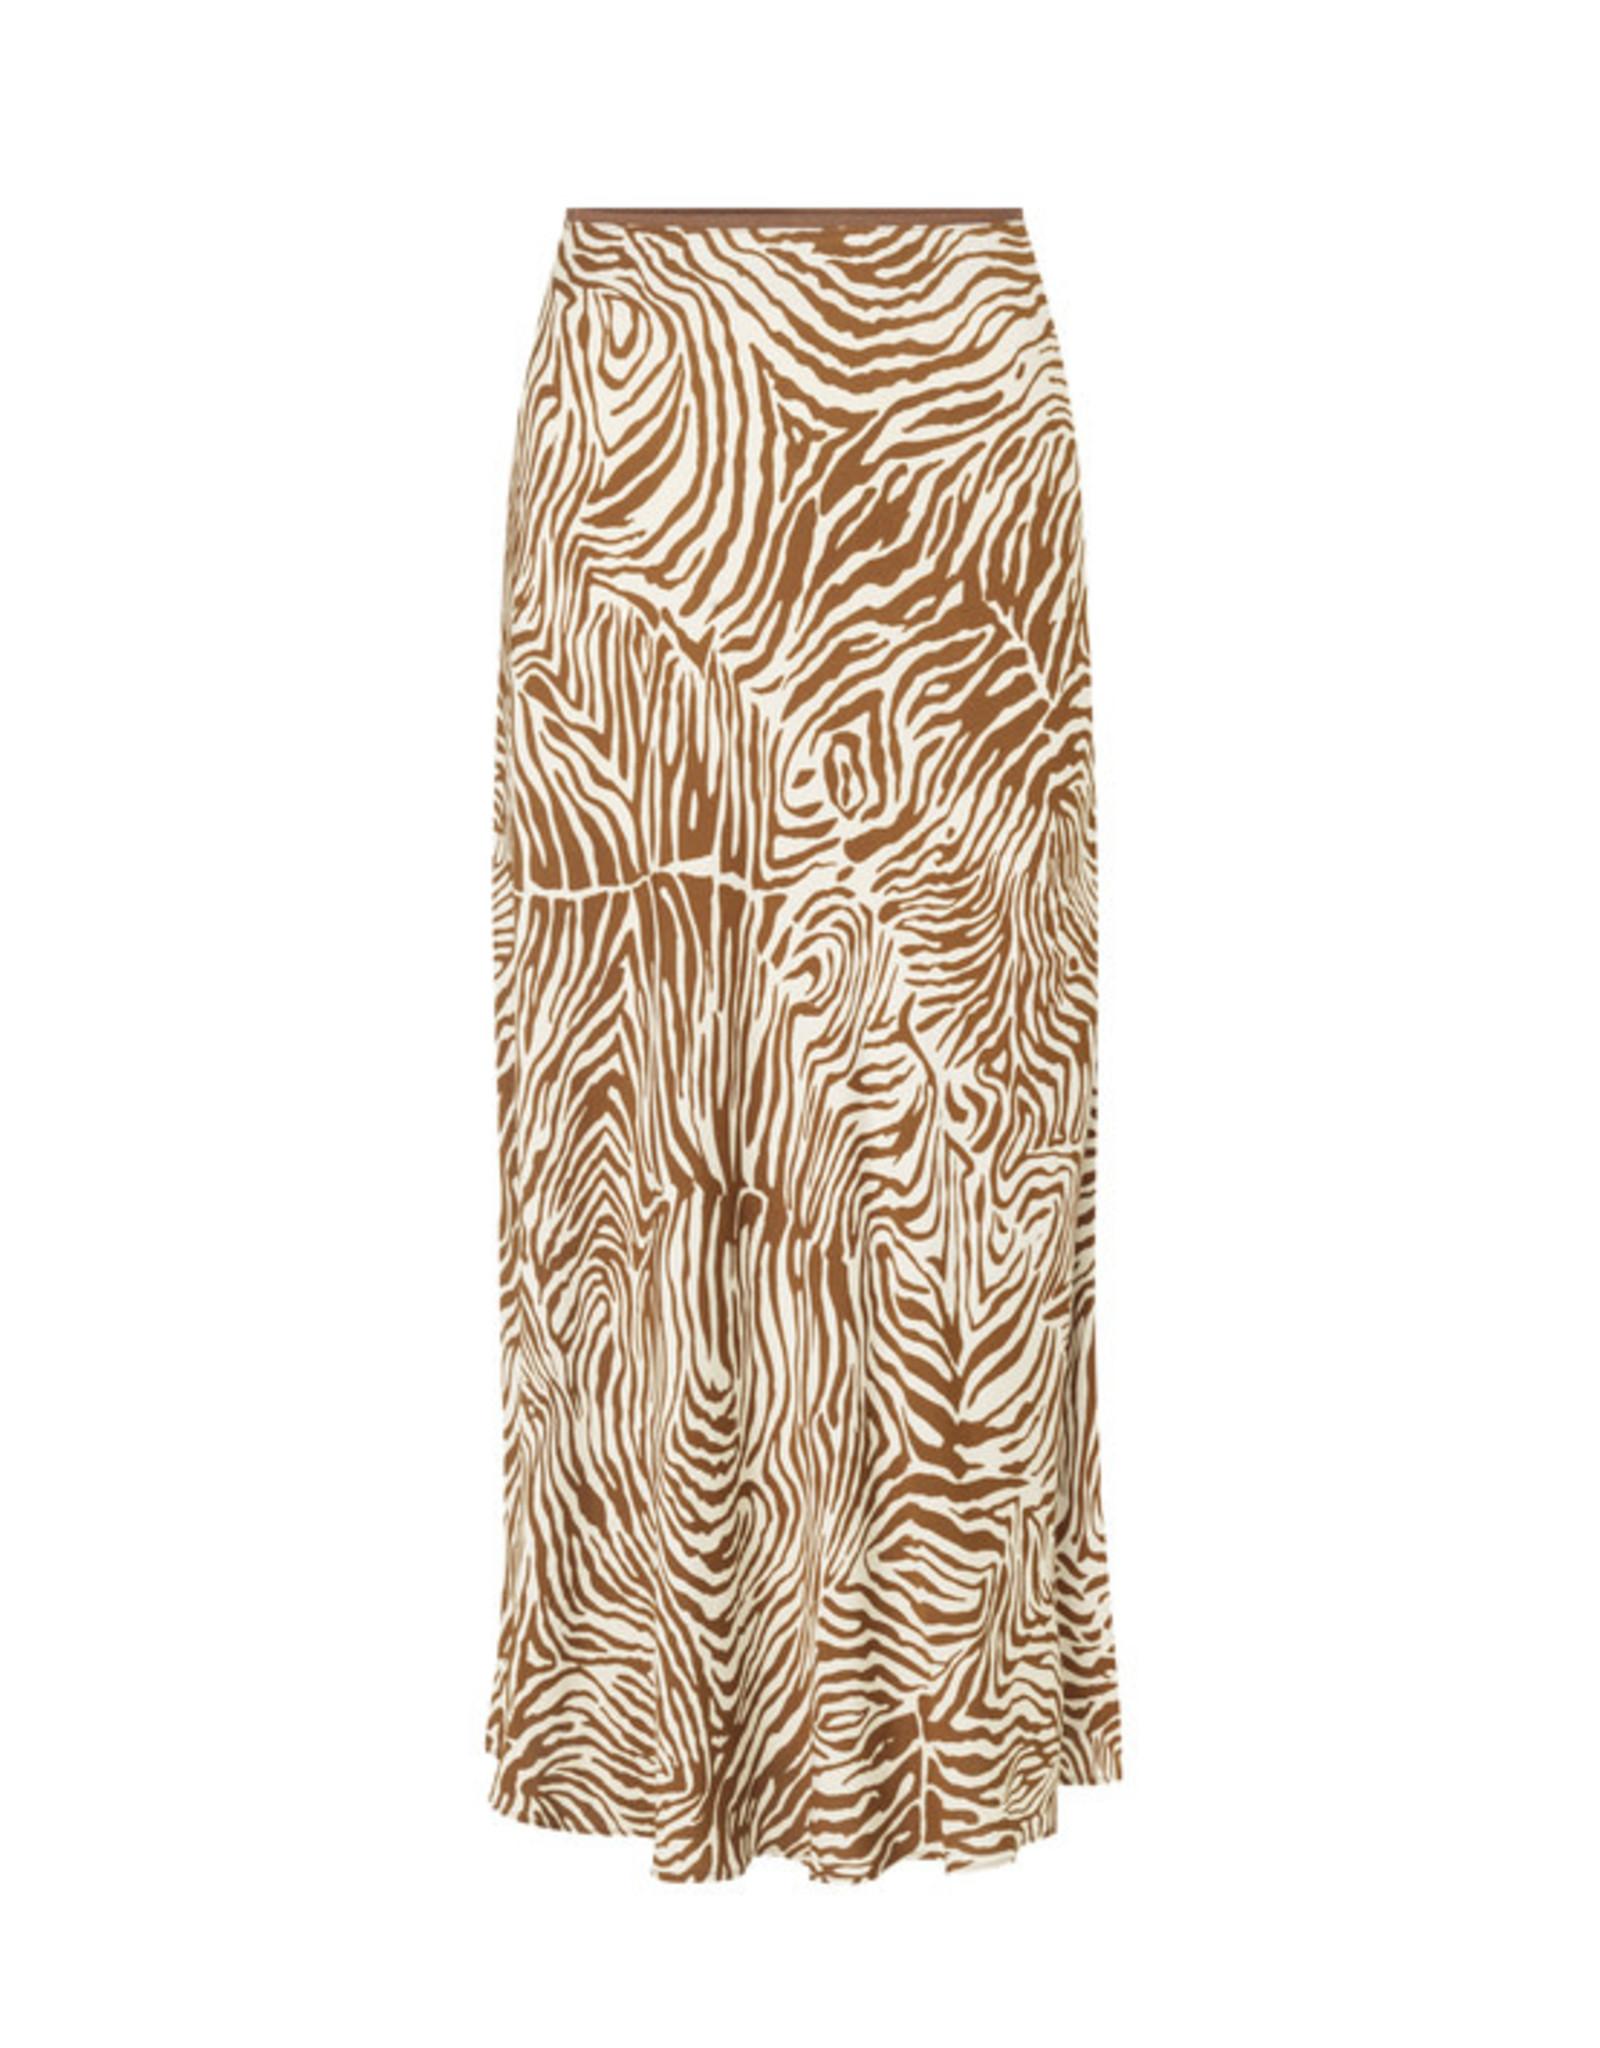 Samsoe & Samsoe Alsop skirt aop Mountain zebra